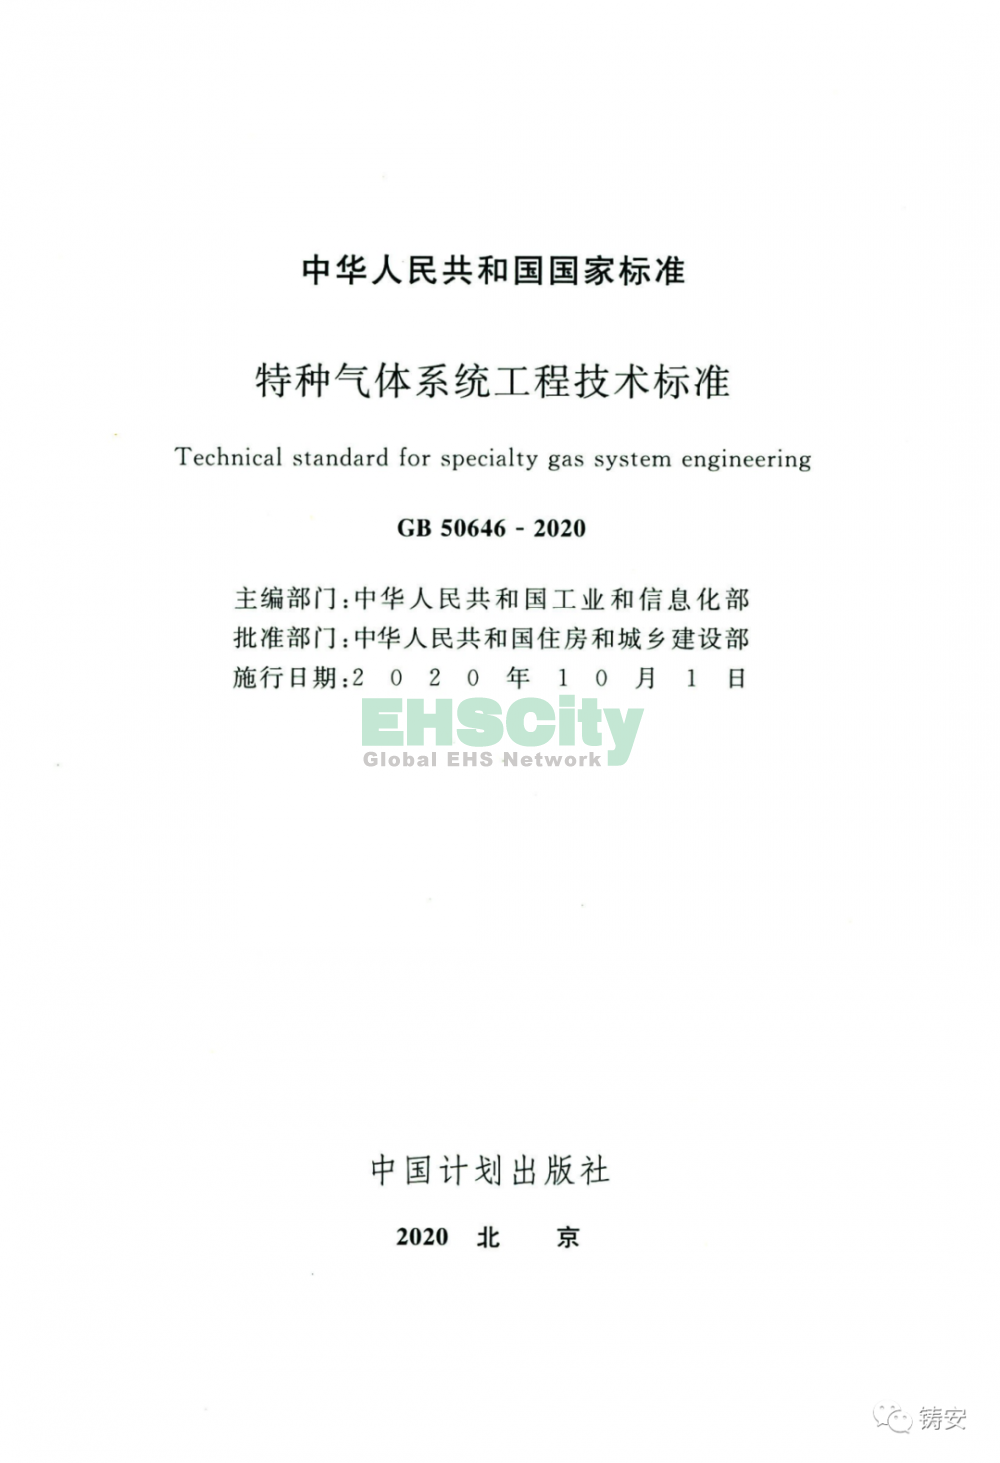 GB50646-2020 特种气体系统工程技术标准 (2)